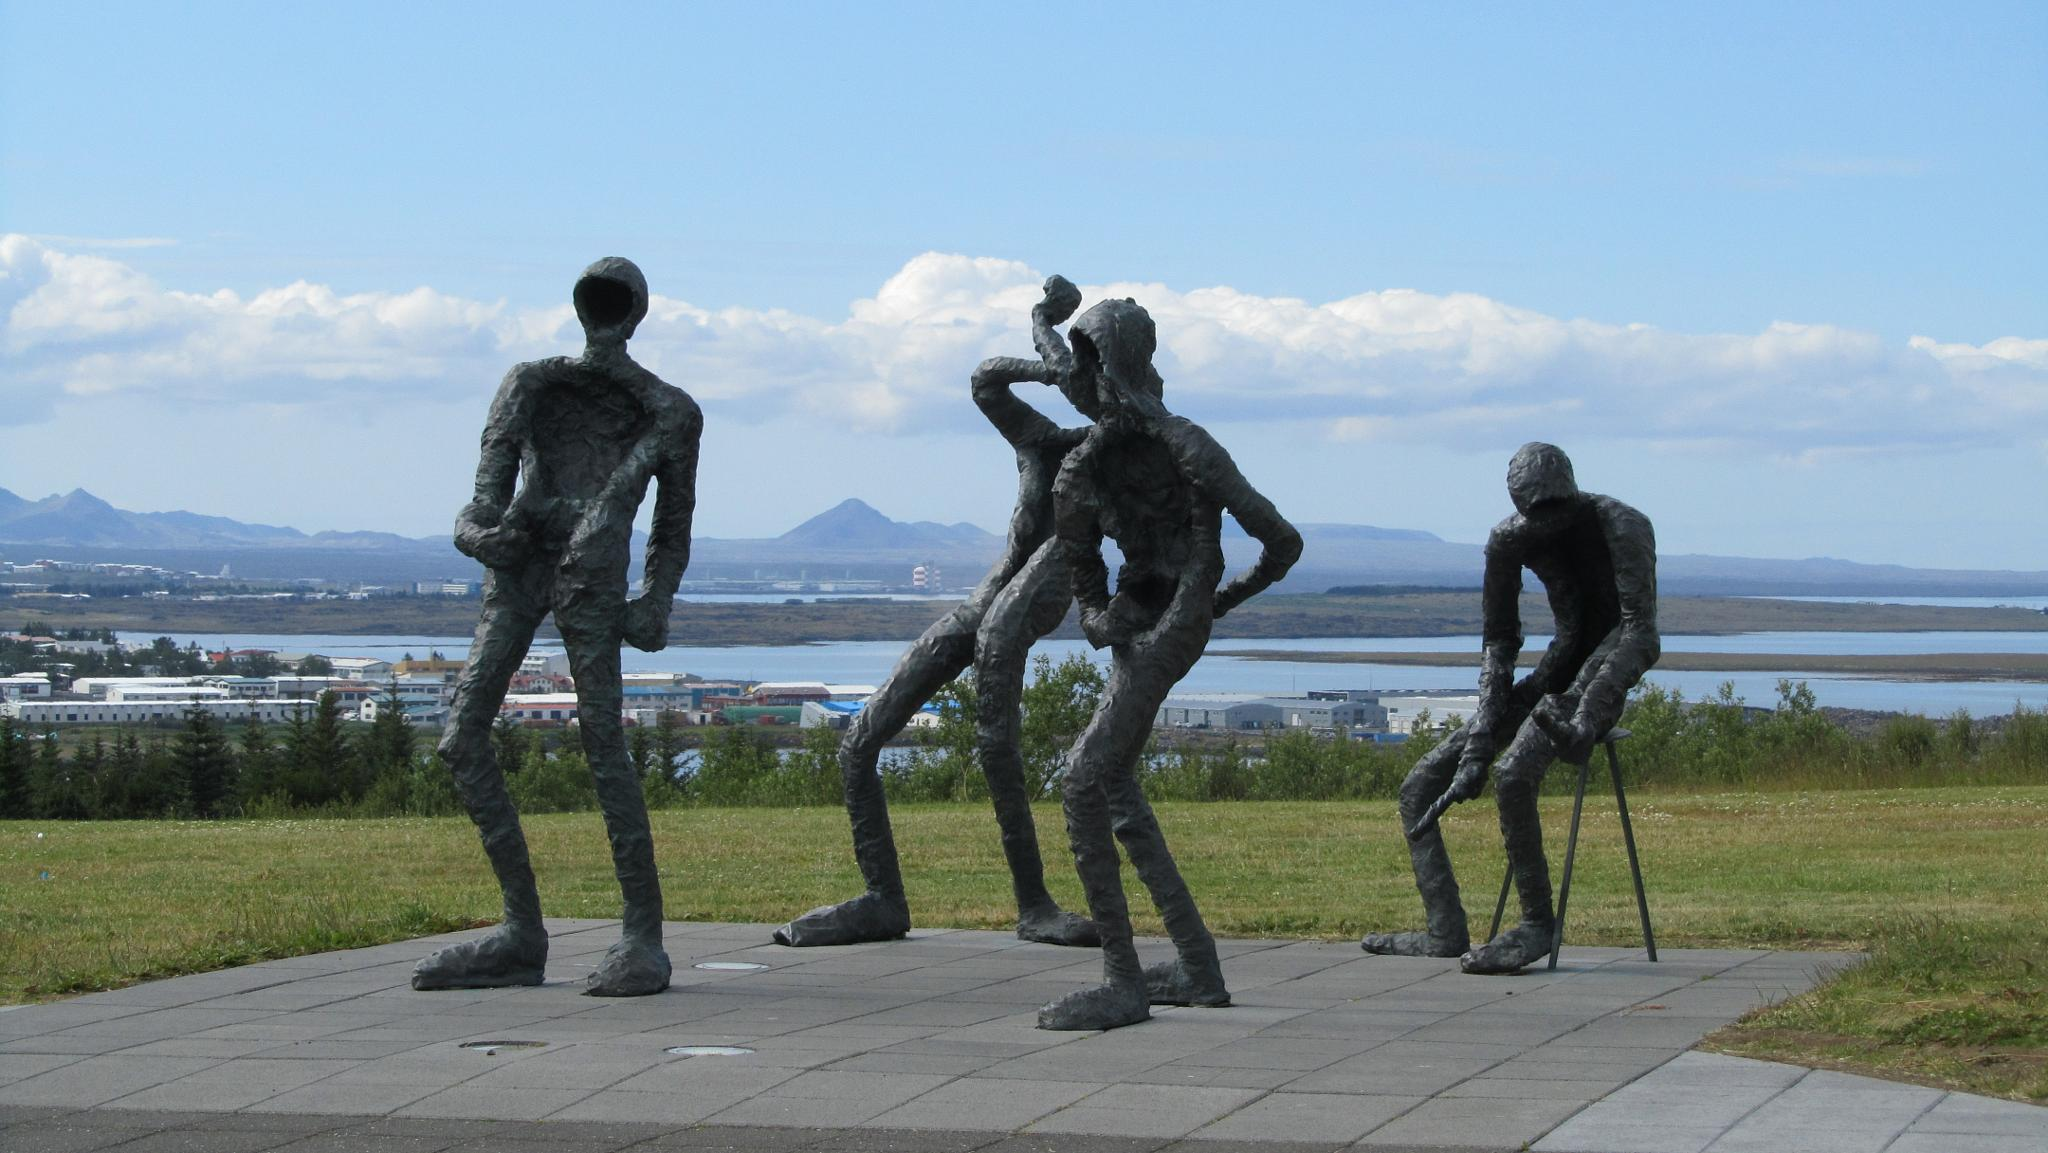 Steel sculptures by ingamay.premros